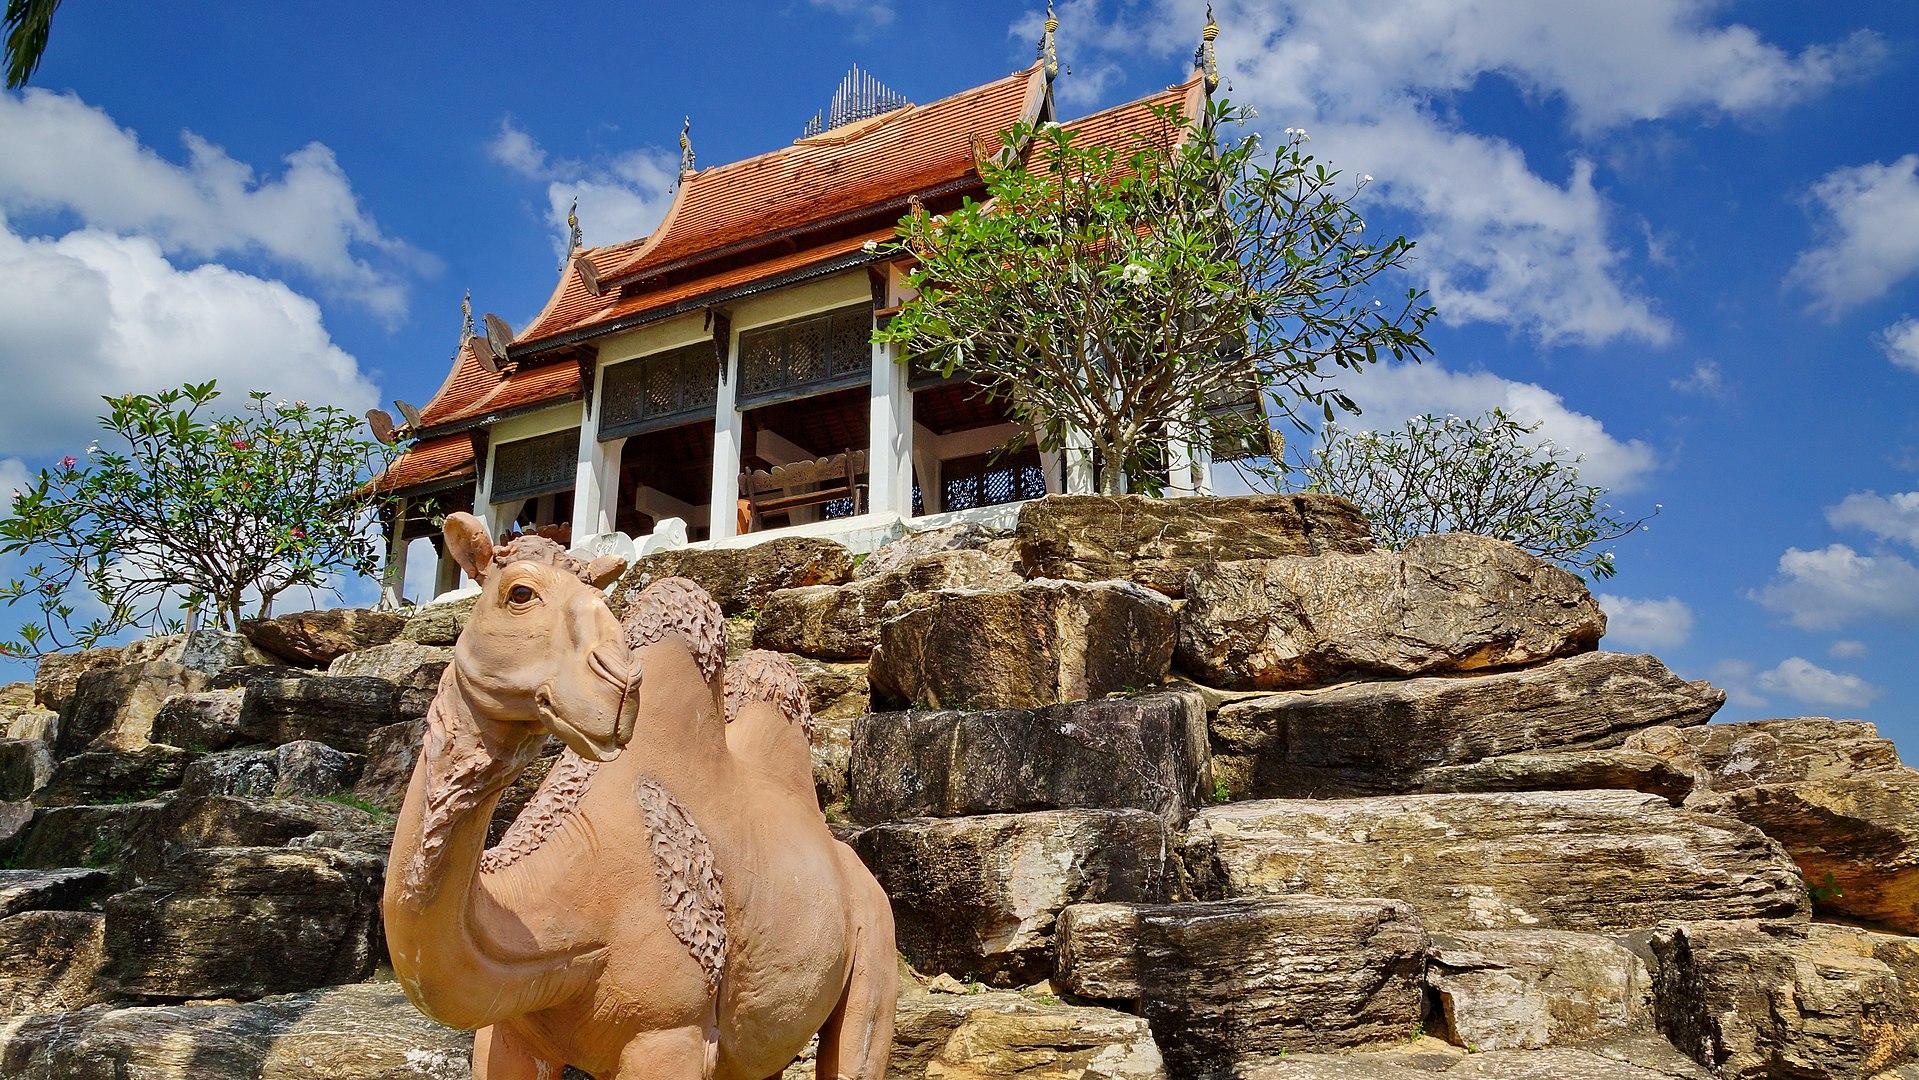 Na Chom Thian, Sattahip District, Chon Buri, Thailand